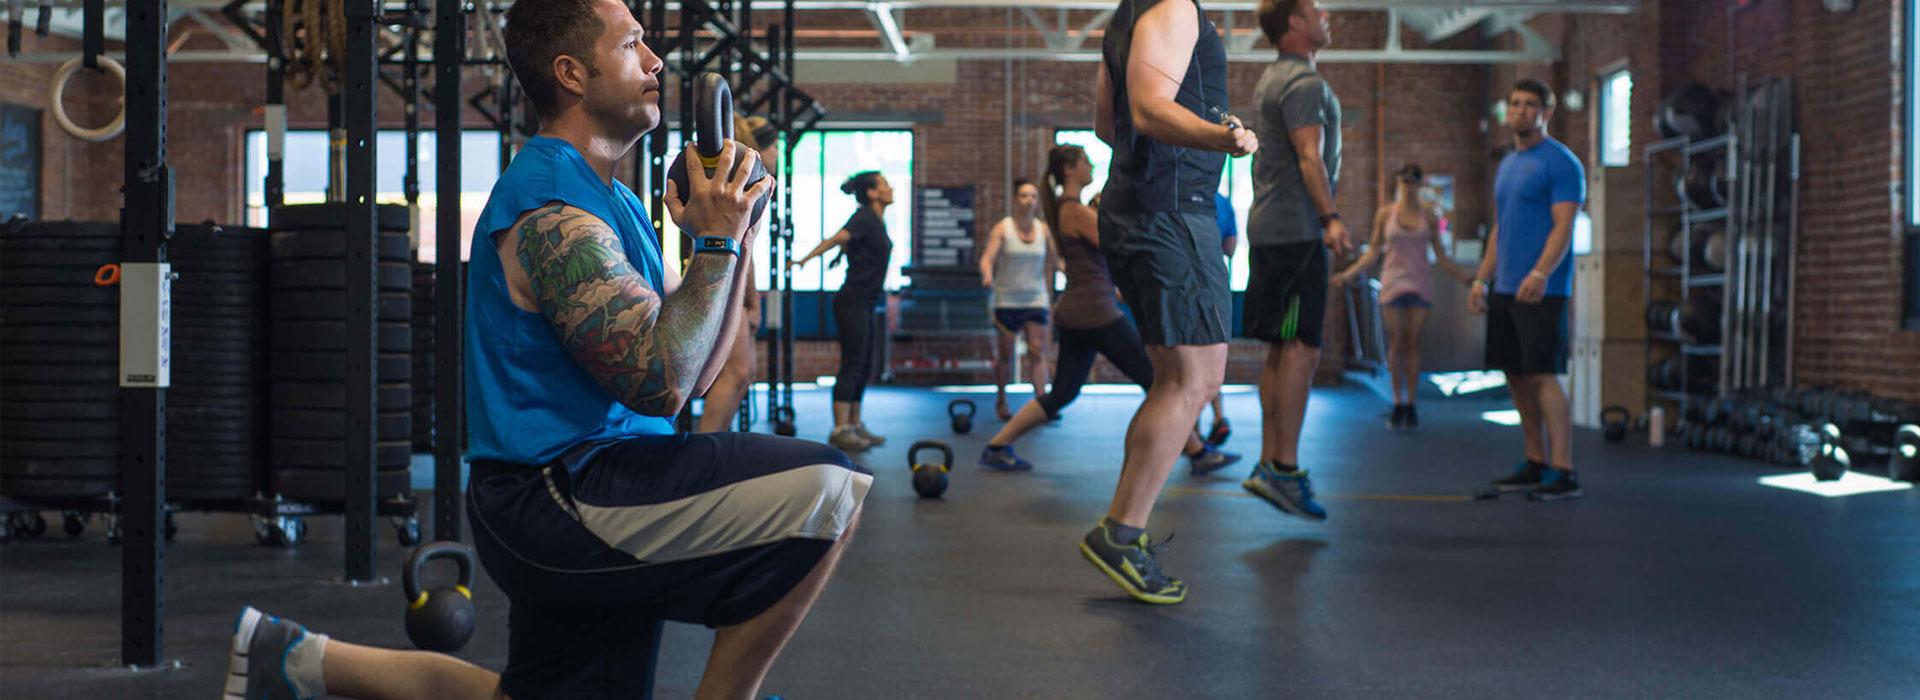 Lean Fitness Classes near Reno NV, Lean Fitness Classes near Sparks NV